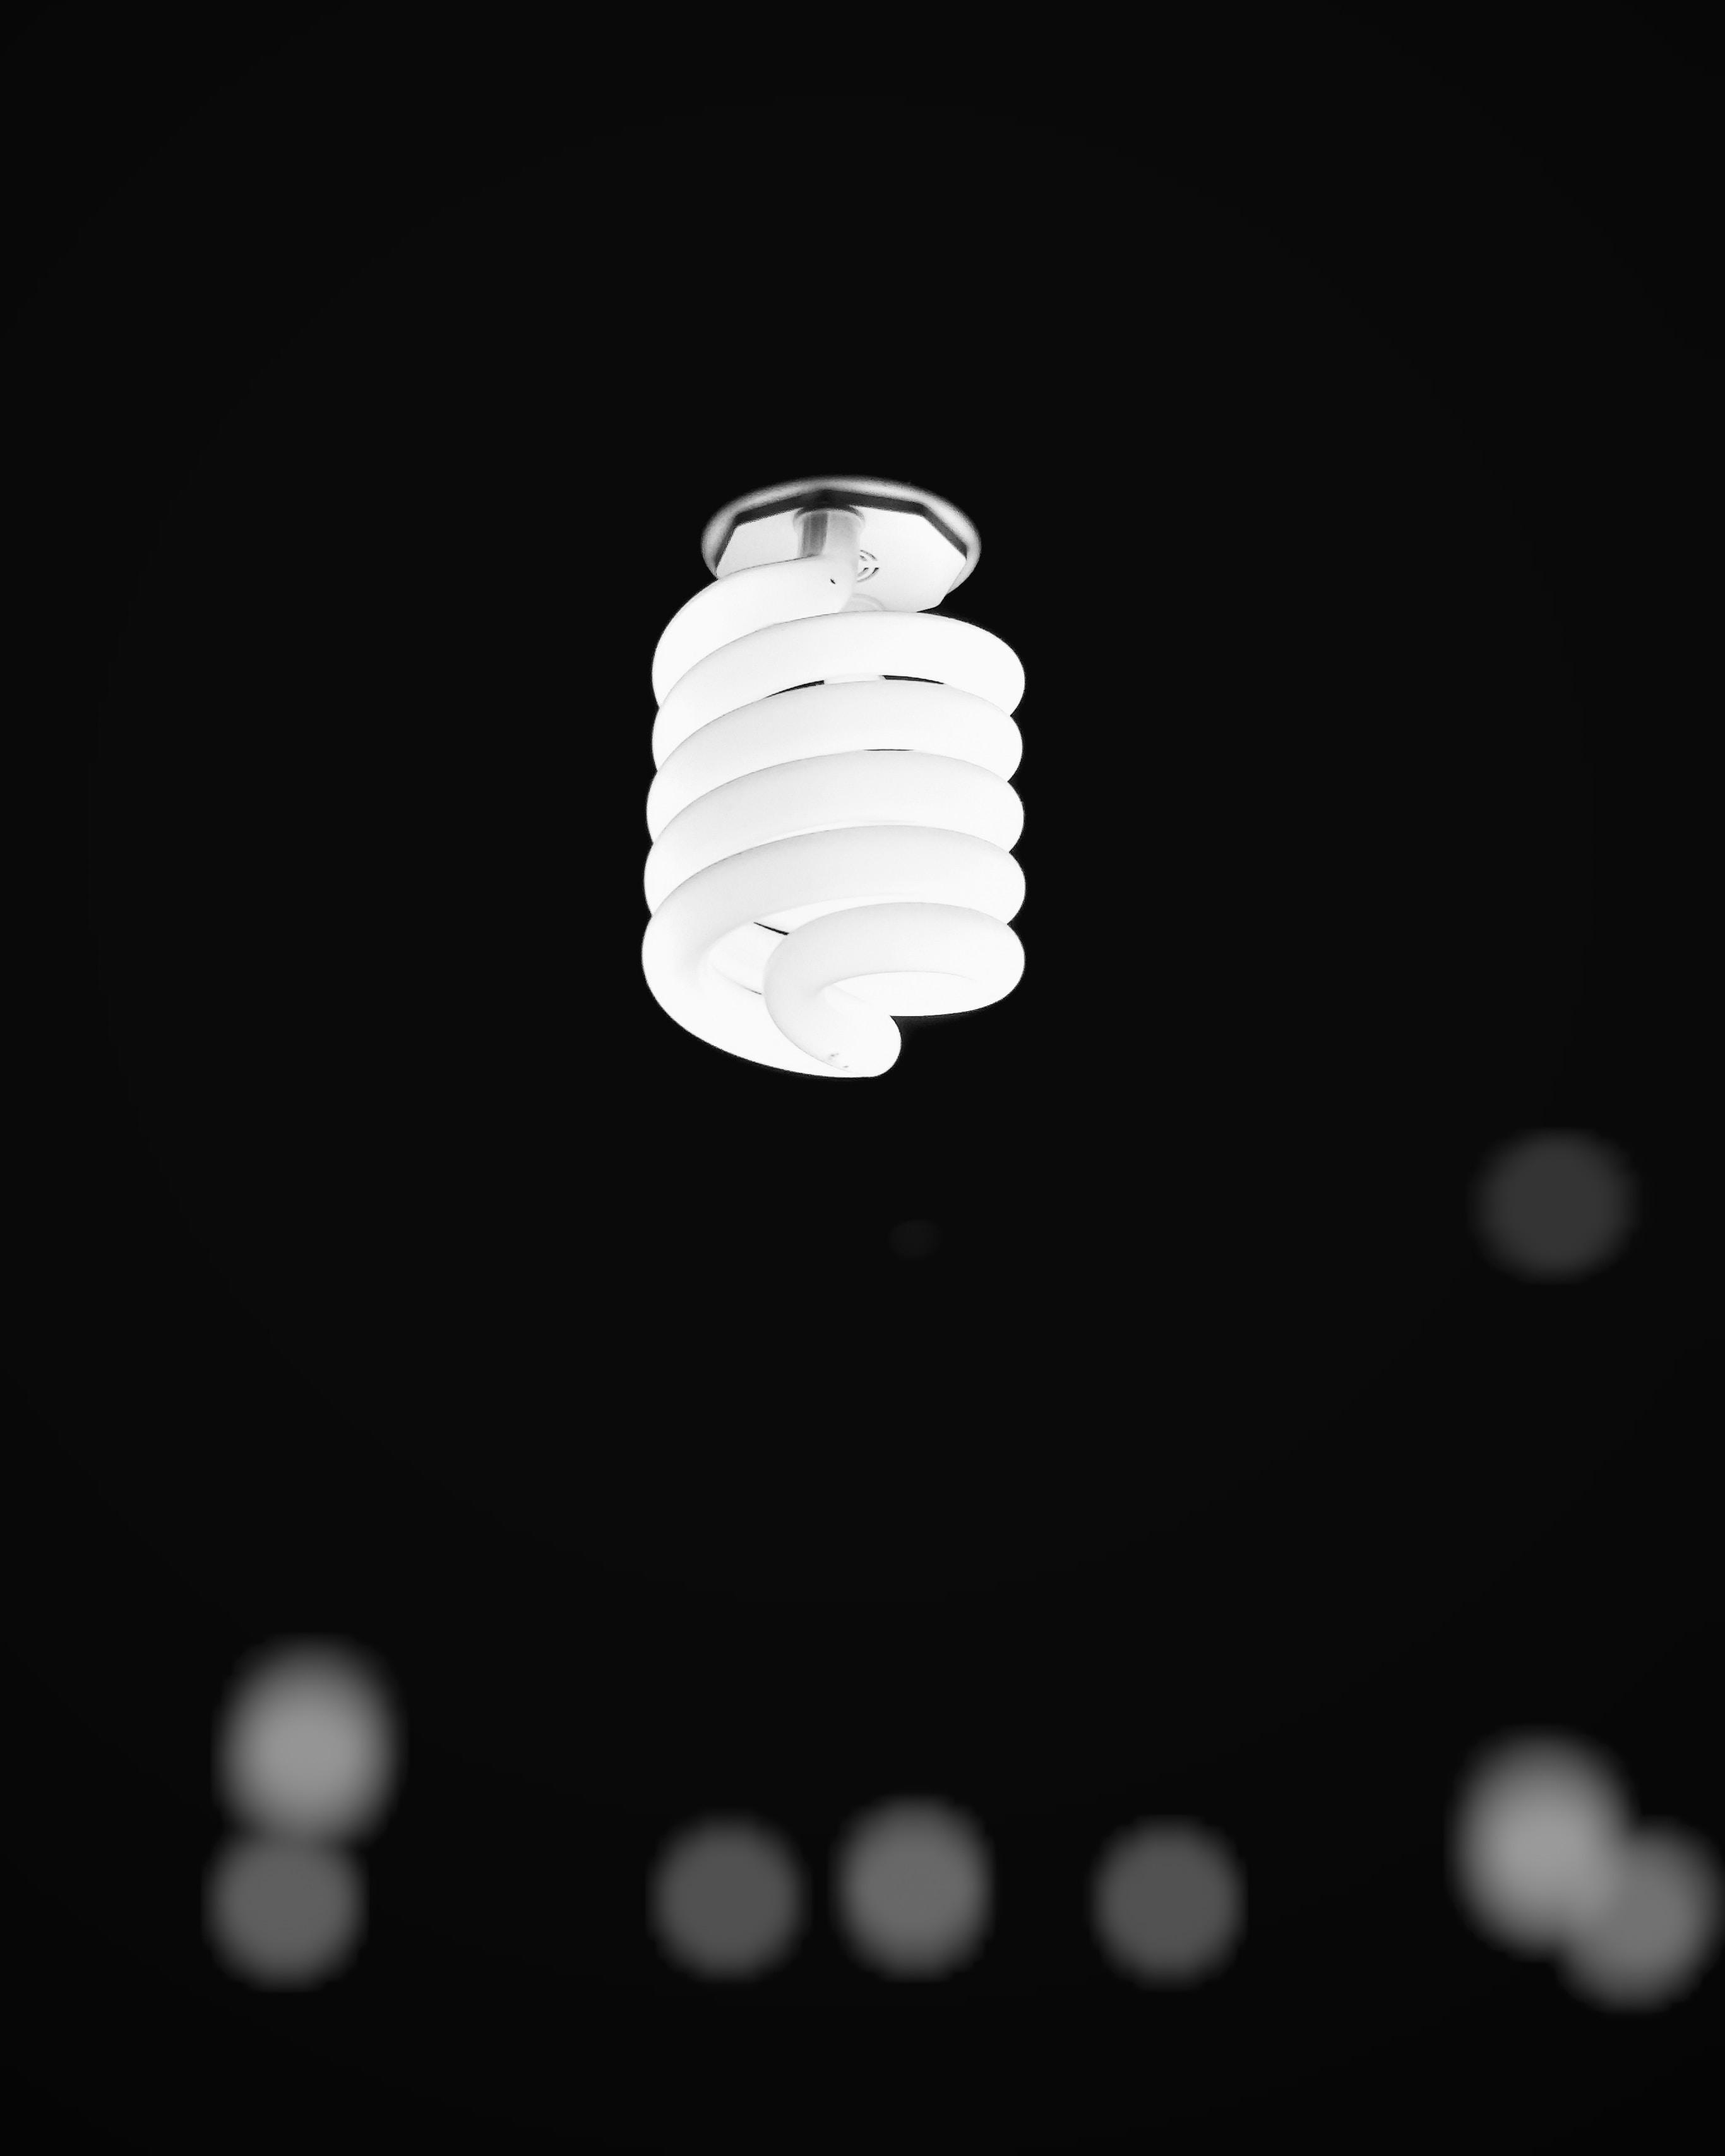 light bulb bokeh photo